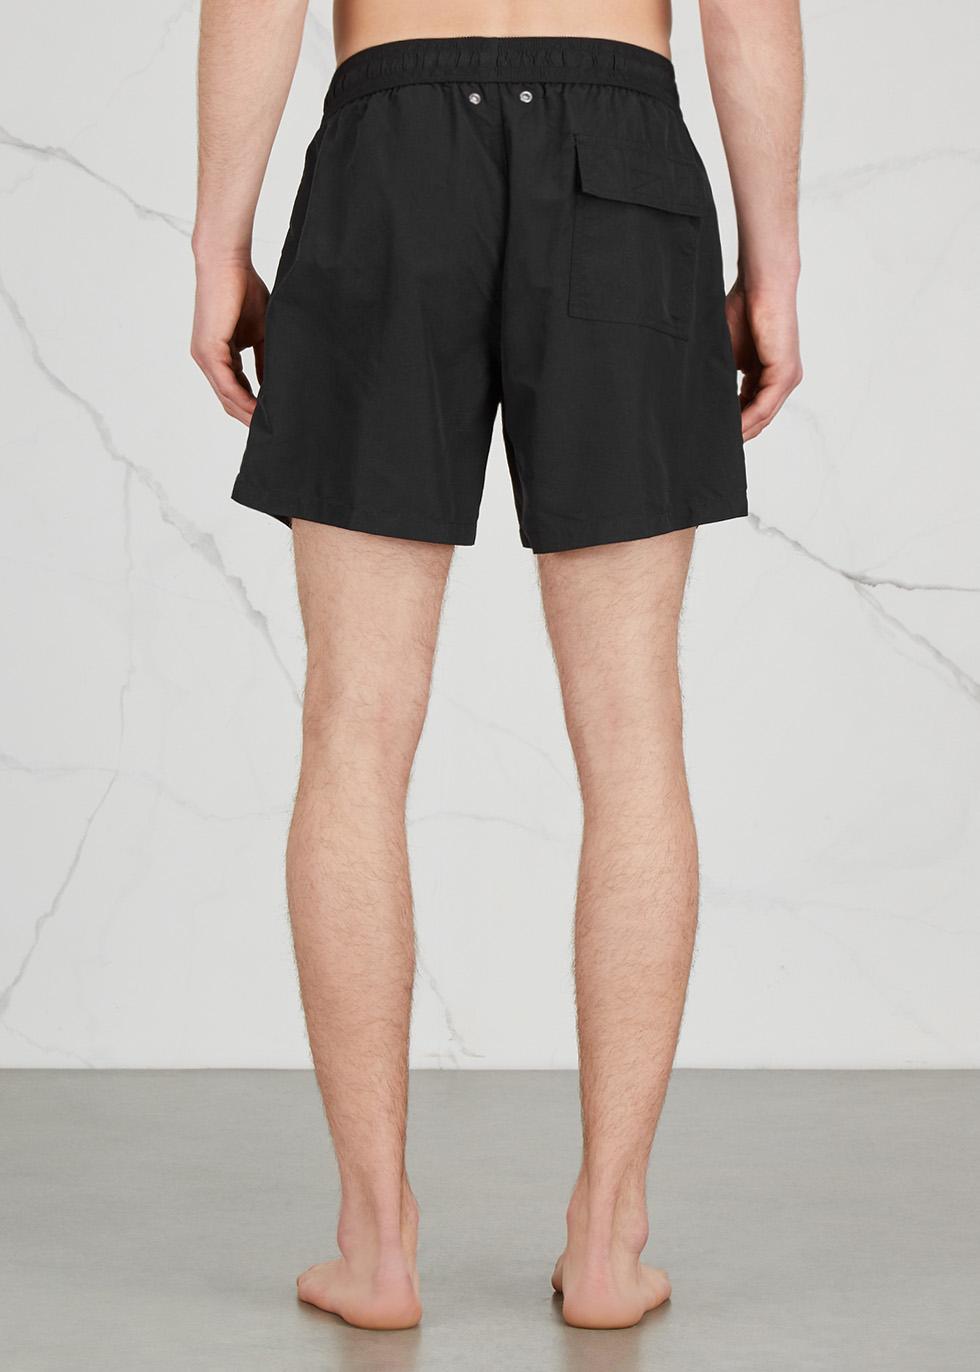 Hawaiian black swim shorts - Polo Ralph Lauren